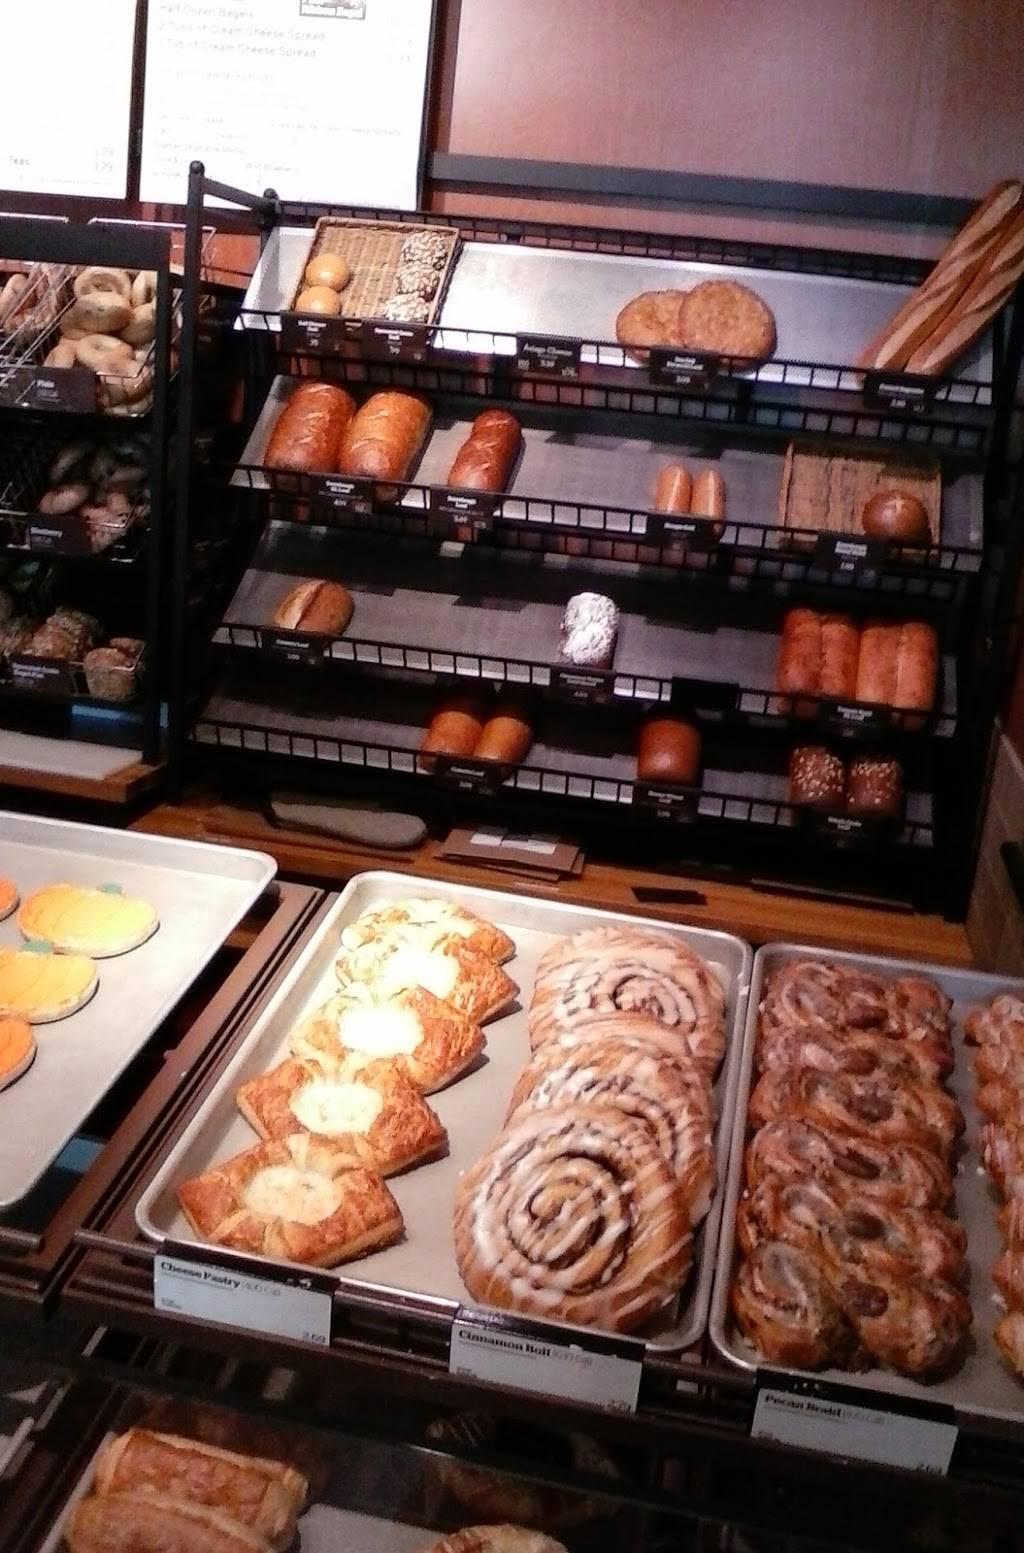 Panera Bread | bakery | 656 W Washington Ave, Madison, WI 53703, USA | 6083540524 OR +1 608-354-0524